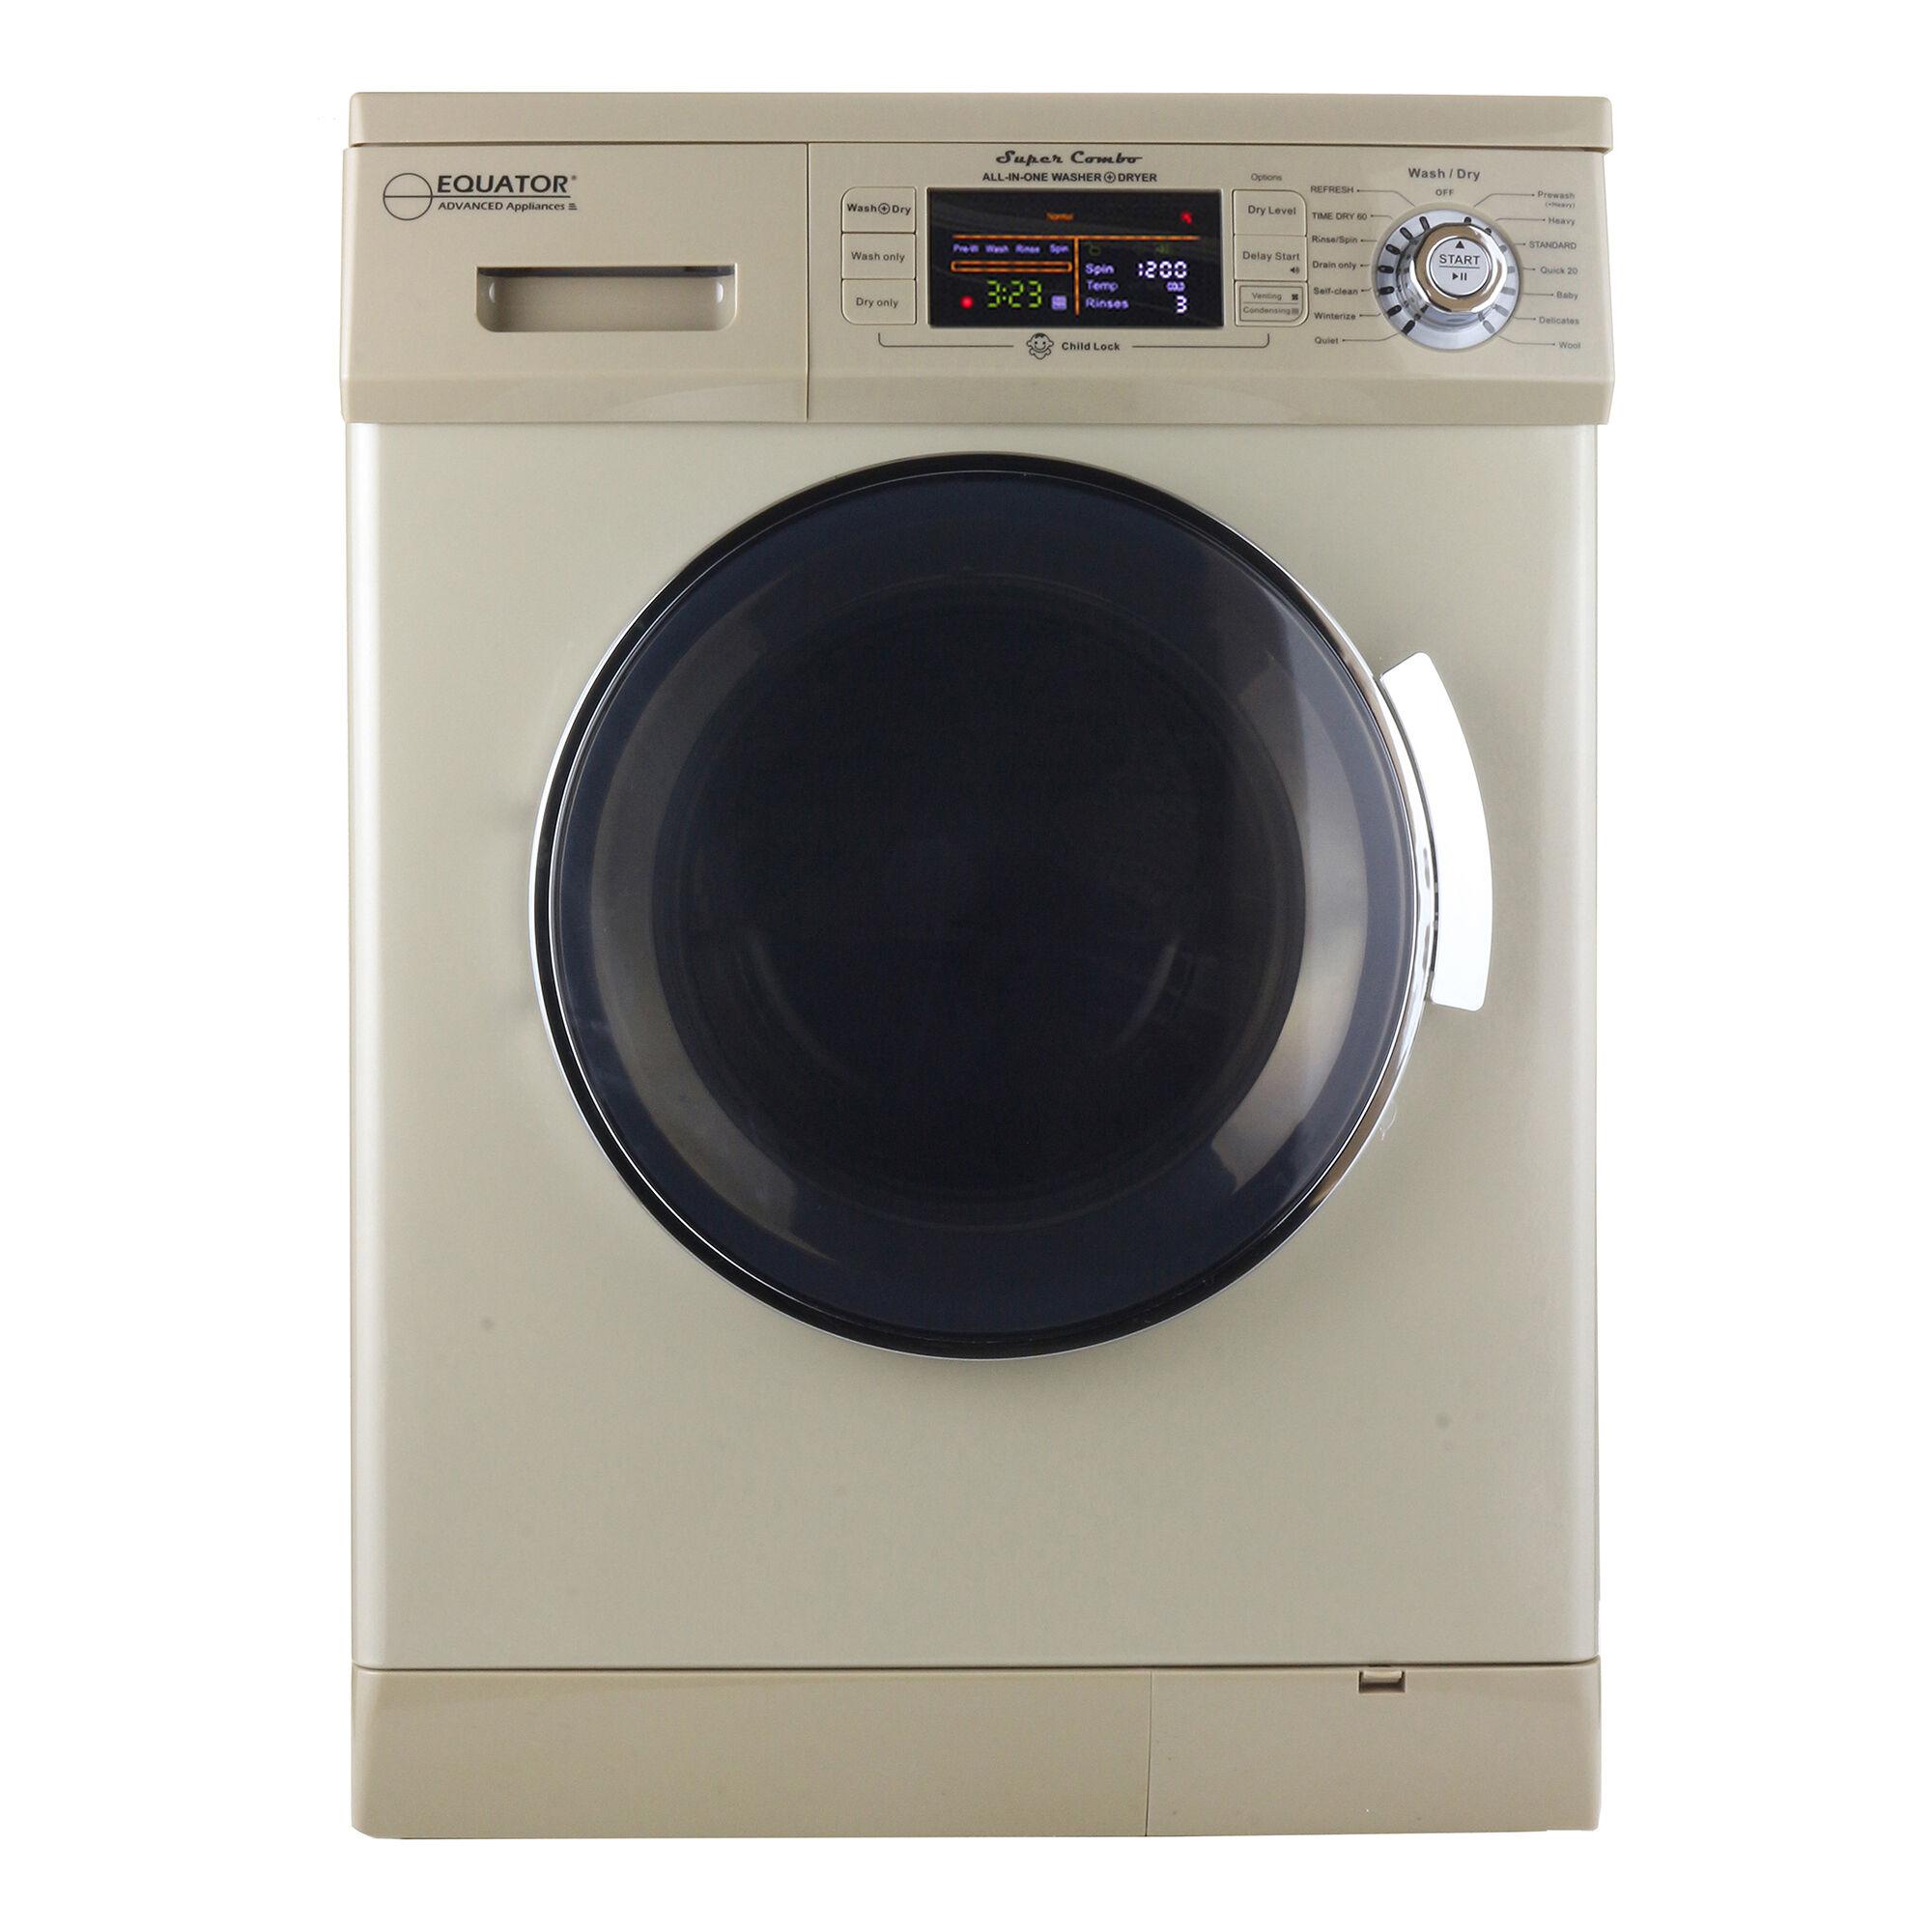 Equator Advanced Appliances Equator EZ4400N Washer/Dryer Combo, Champagne Gold